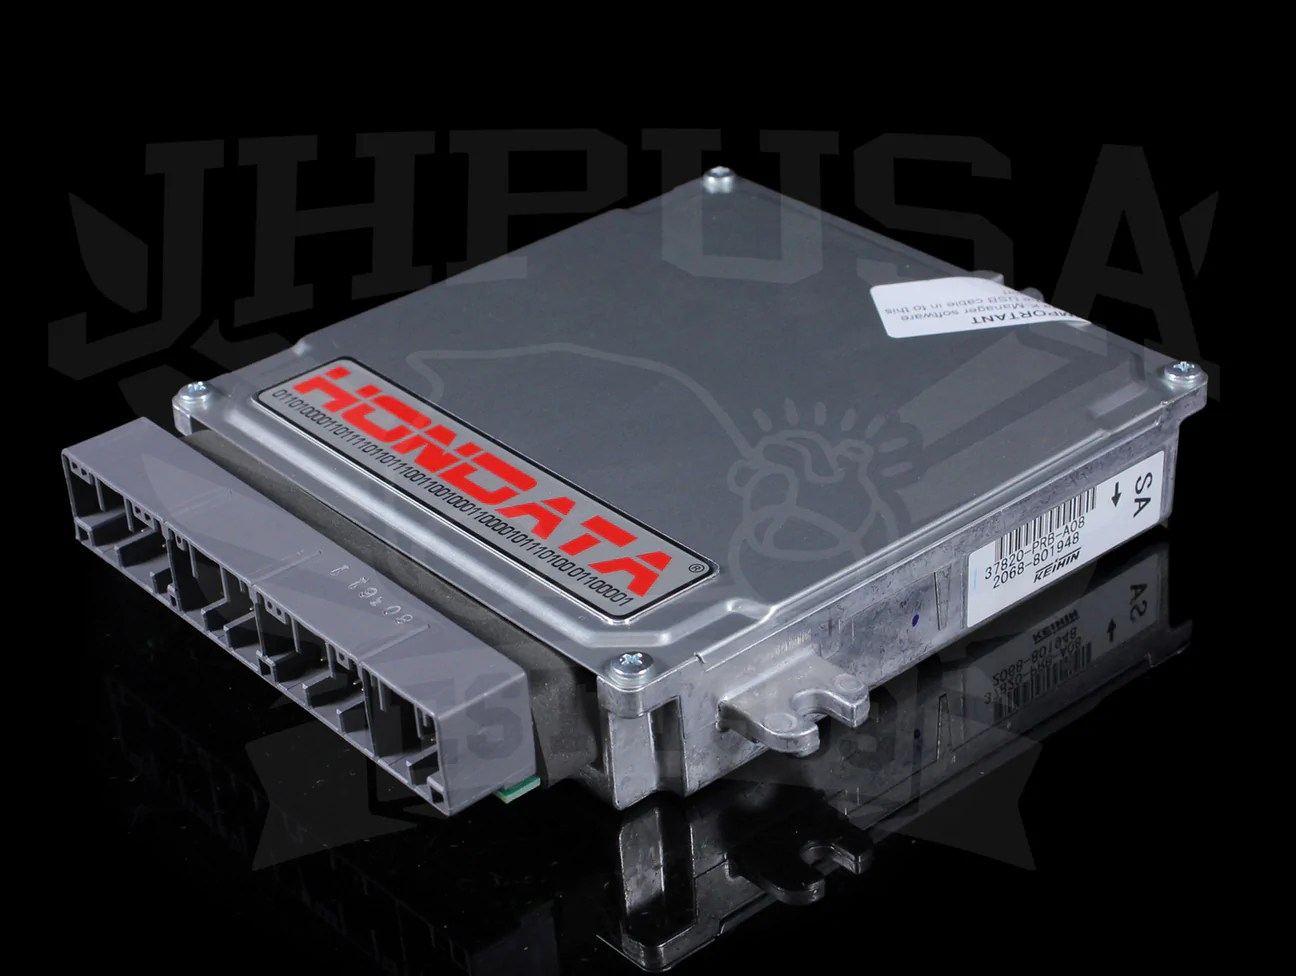 medium resolution of  hondata k pro s2000 with ecu 00 05 s2000